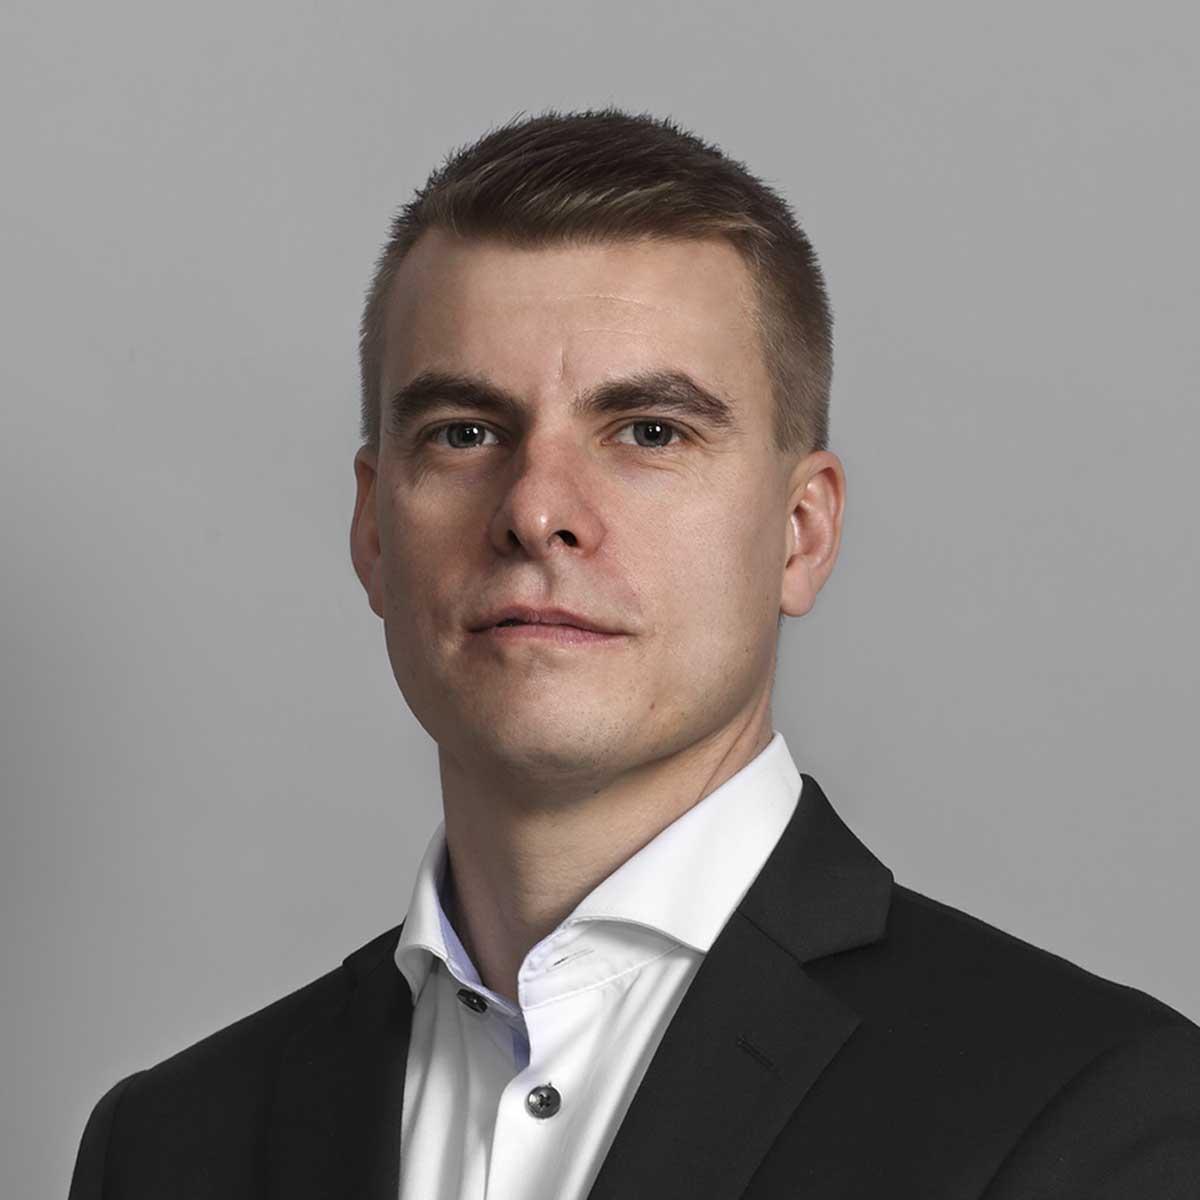 Joakim Tuutti